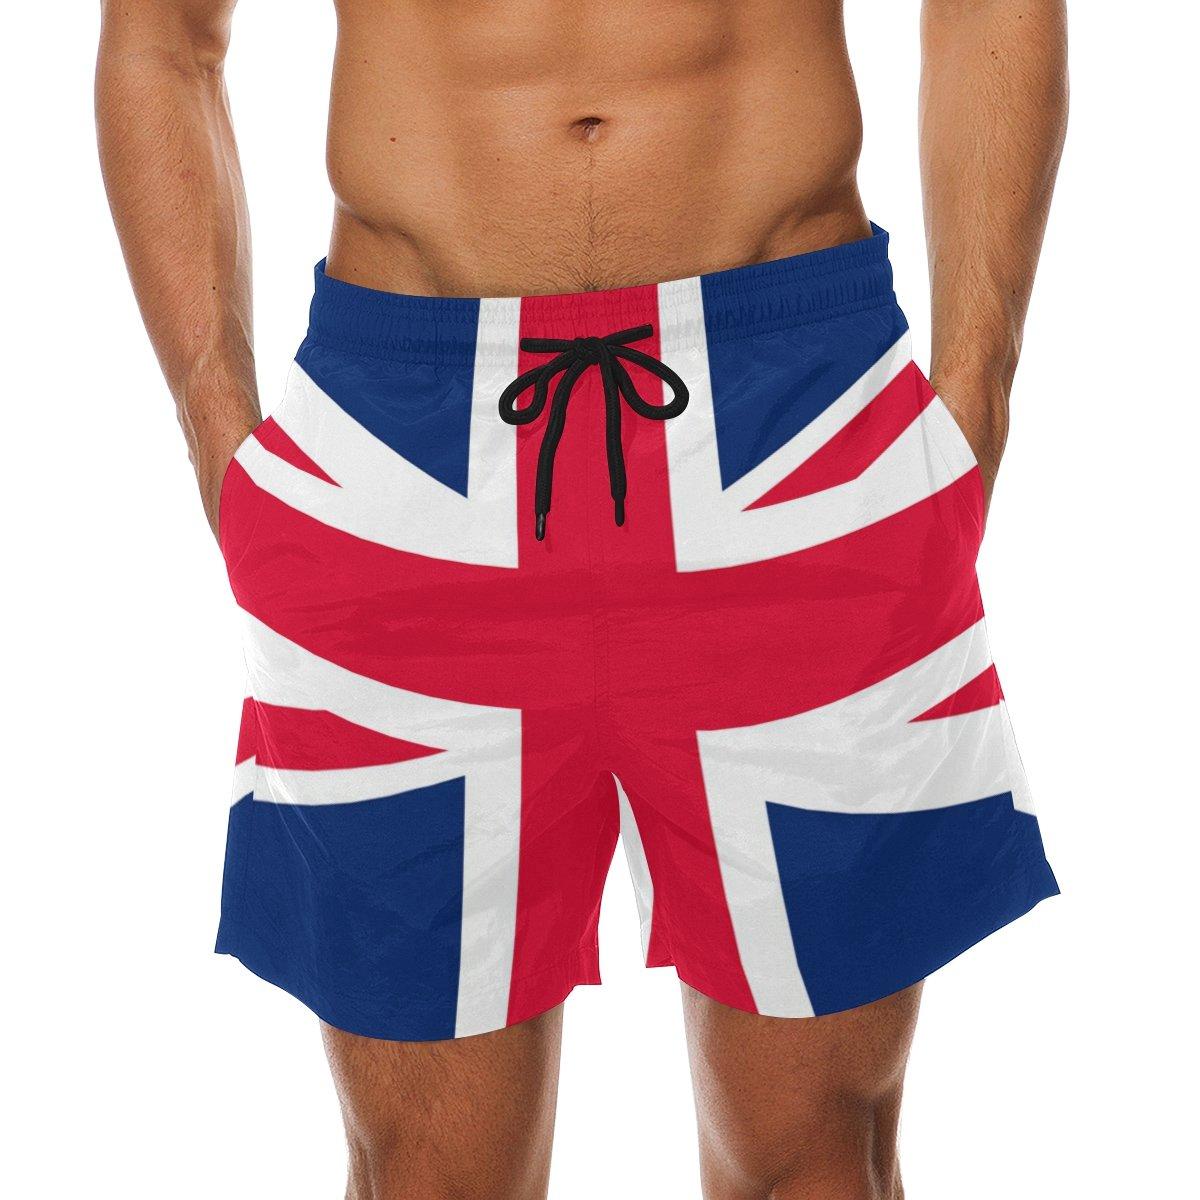 DEYYA Art Tree Paintings Summer Beach Shorts Pants Mens Swim Trunks Board Short for Men